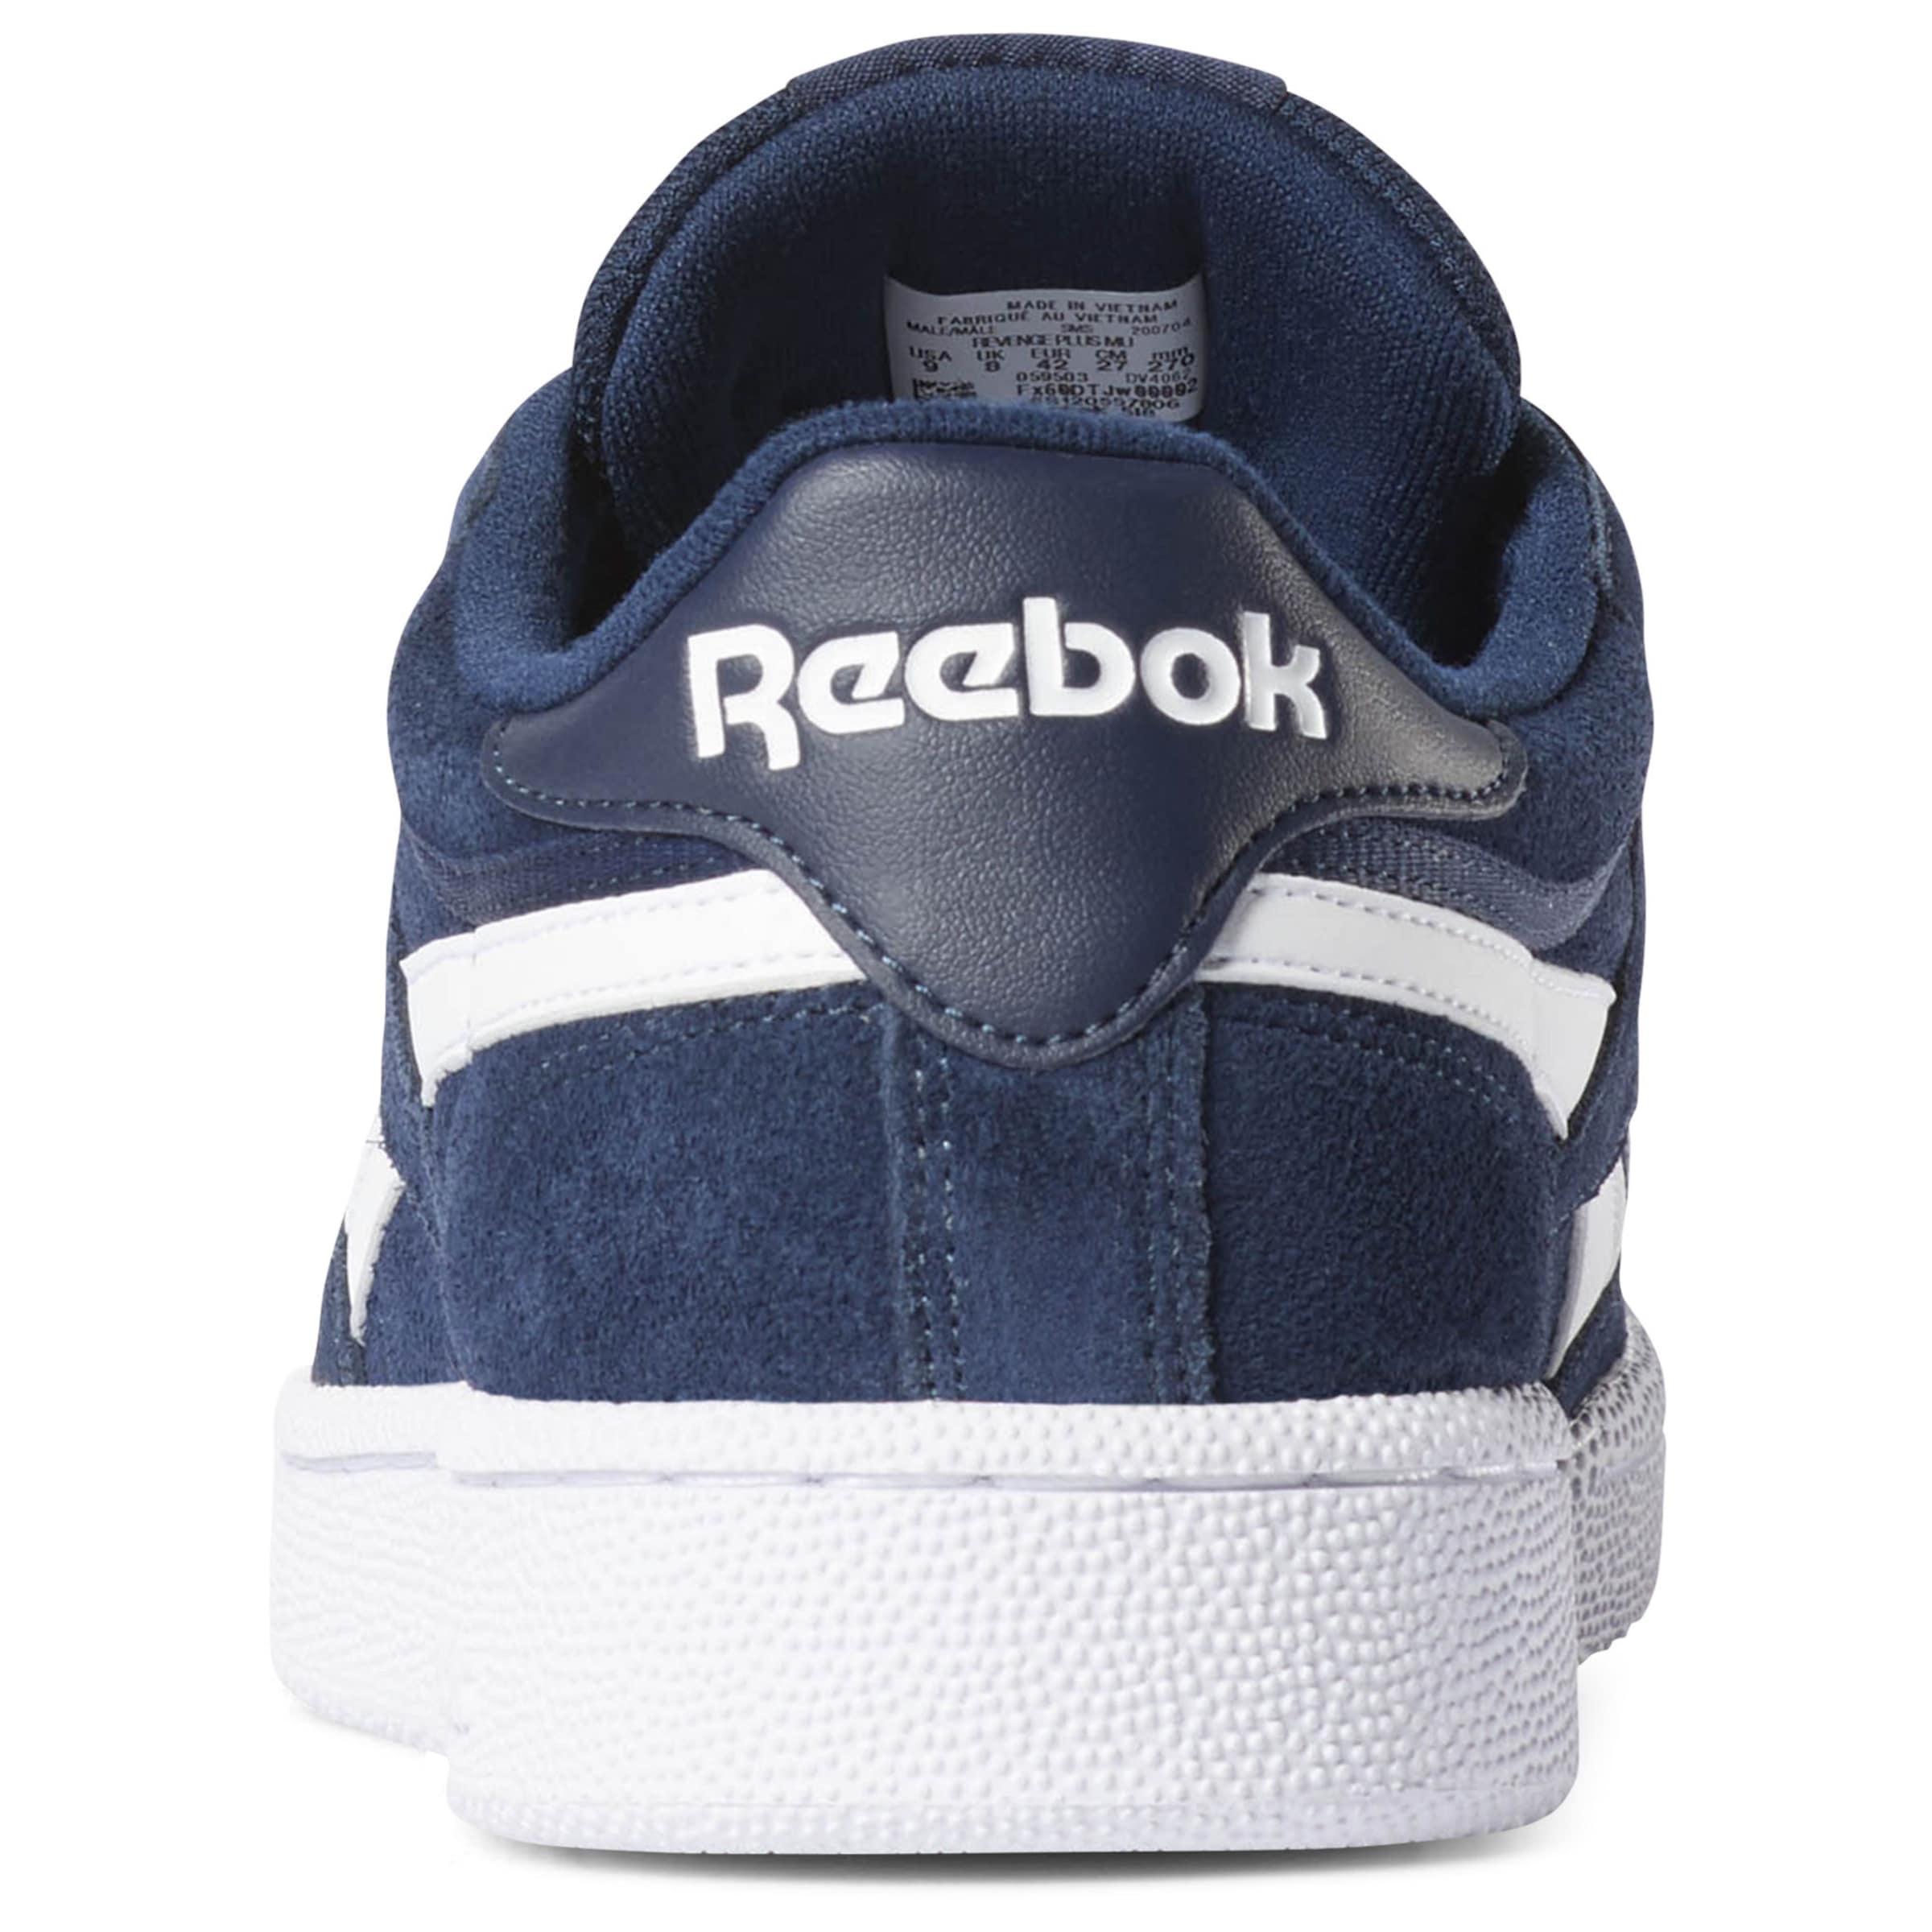 Reebok Reebok Reebok classic Schuhe 'Revenge Plus Leder Markenrabatt cfd880